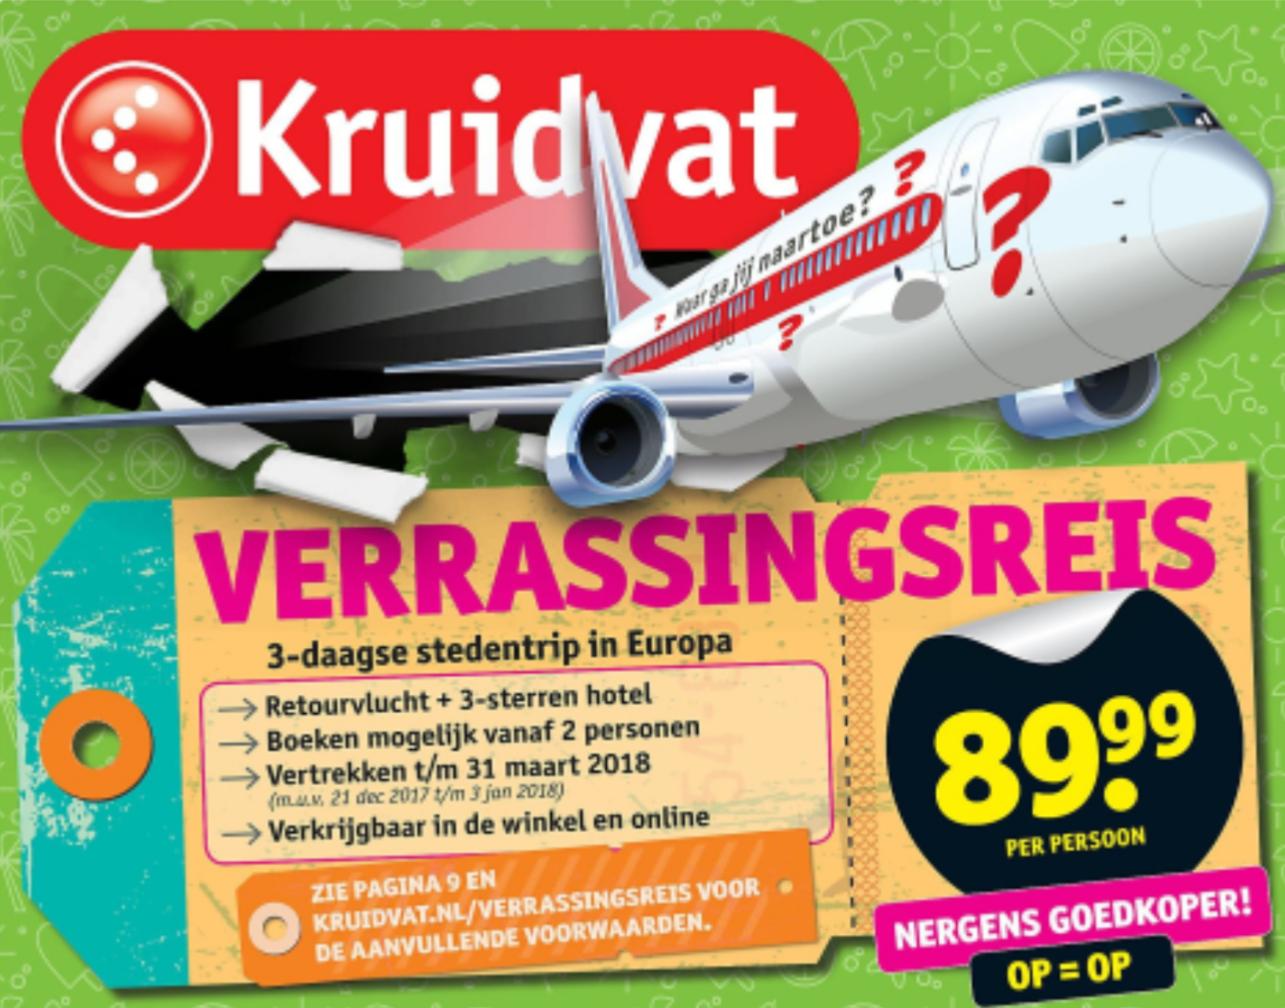 Verrassingsreis - 3 daagse stedentrip in Europa met retourvlucht en 3 sterren hotel voor €89 p.p. @ Kruidvat